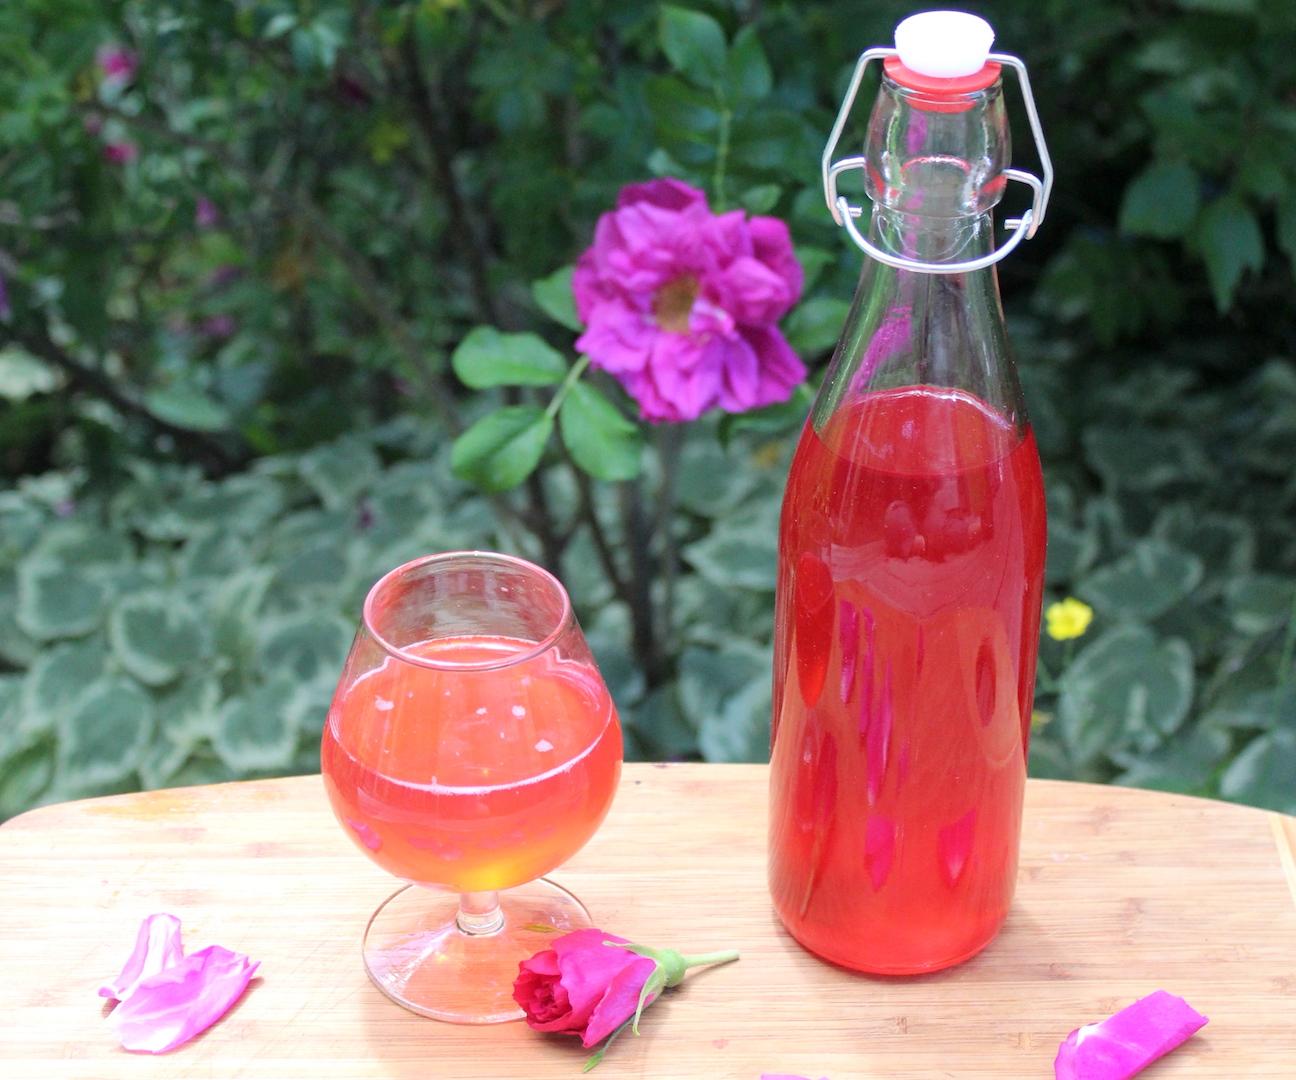 Homemade Rose Cordial